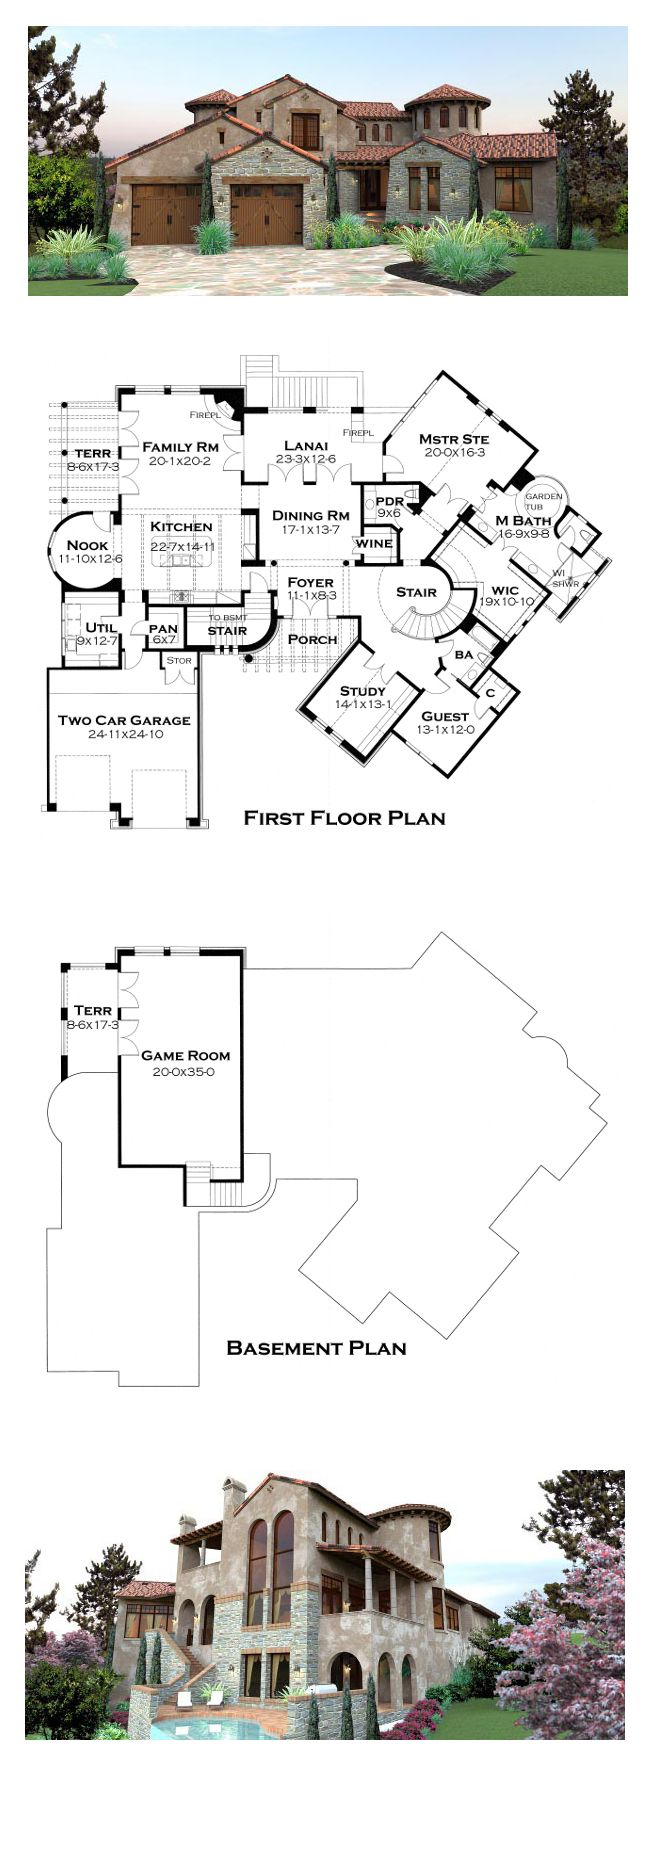 Best 25 italian houses ideas on pinterest italian for Tuscan villa floor plans